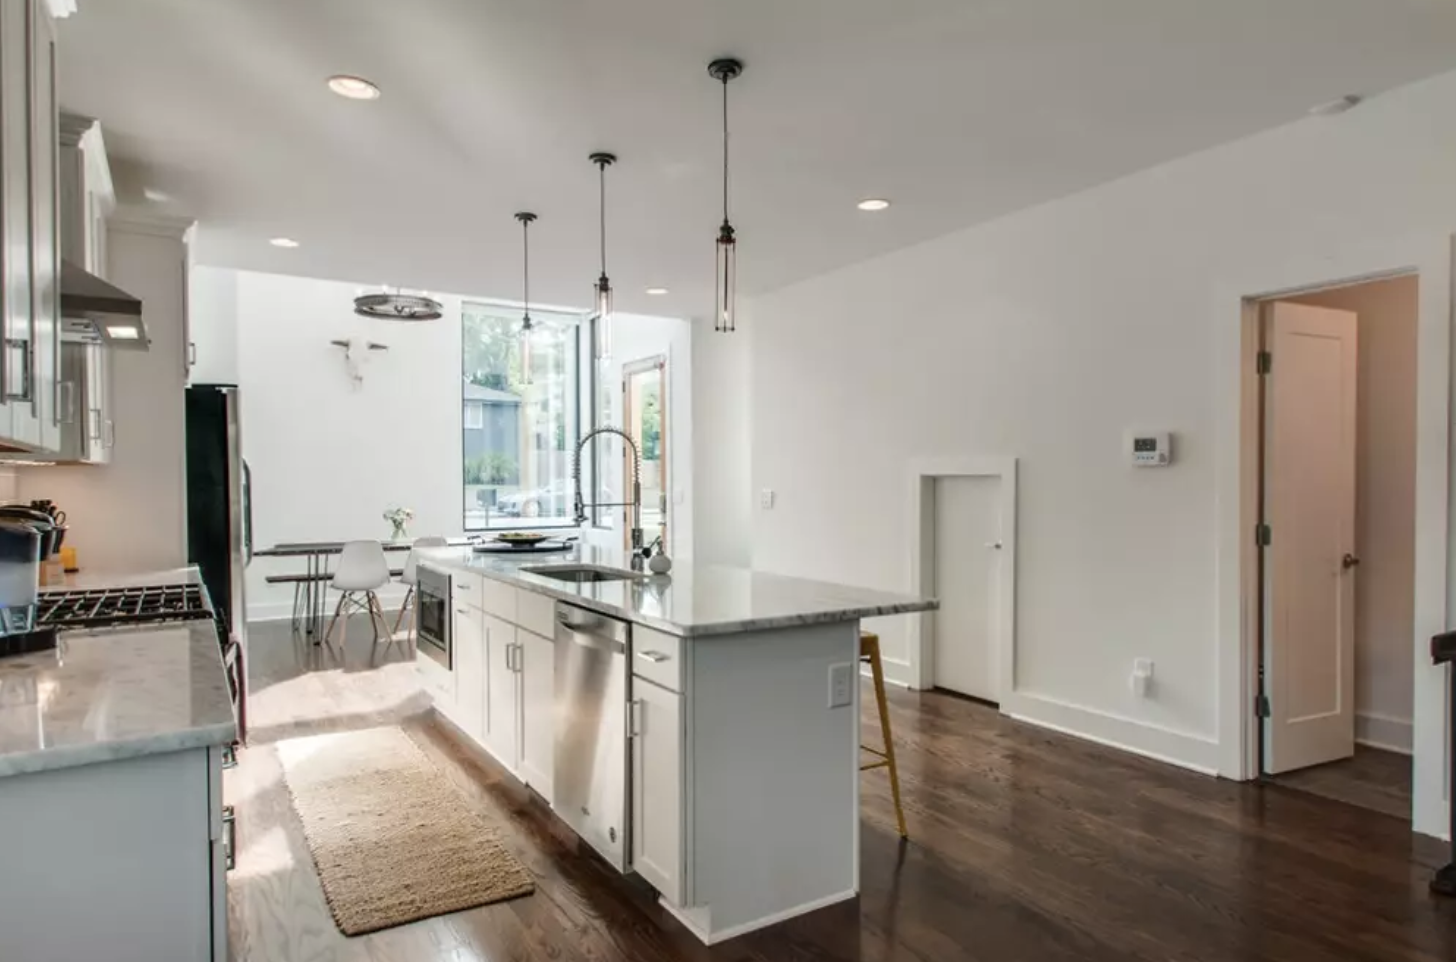 airbnb home rental in nashville.png